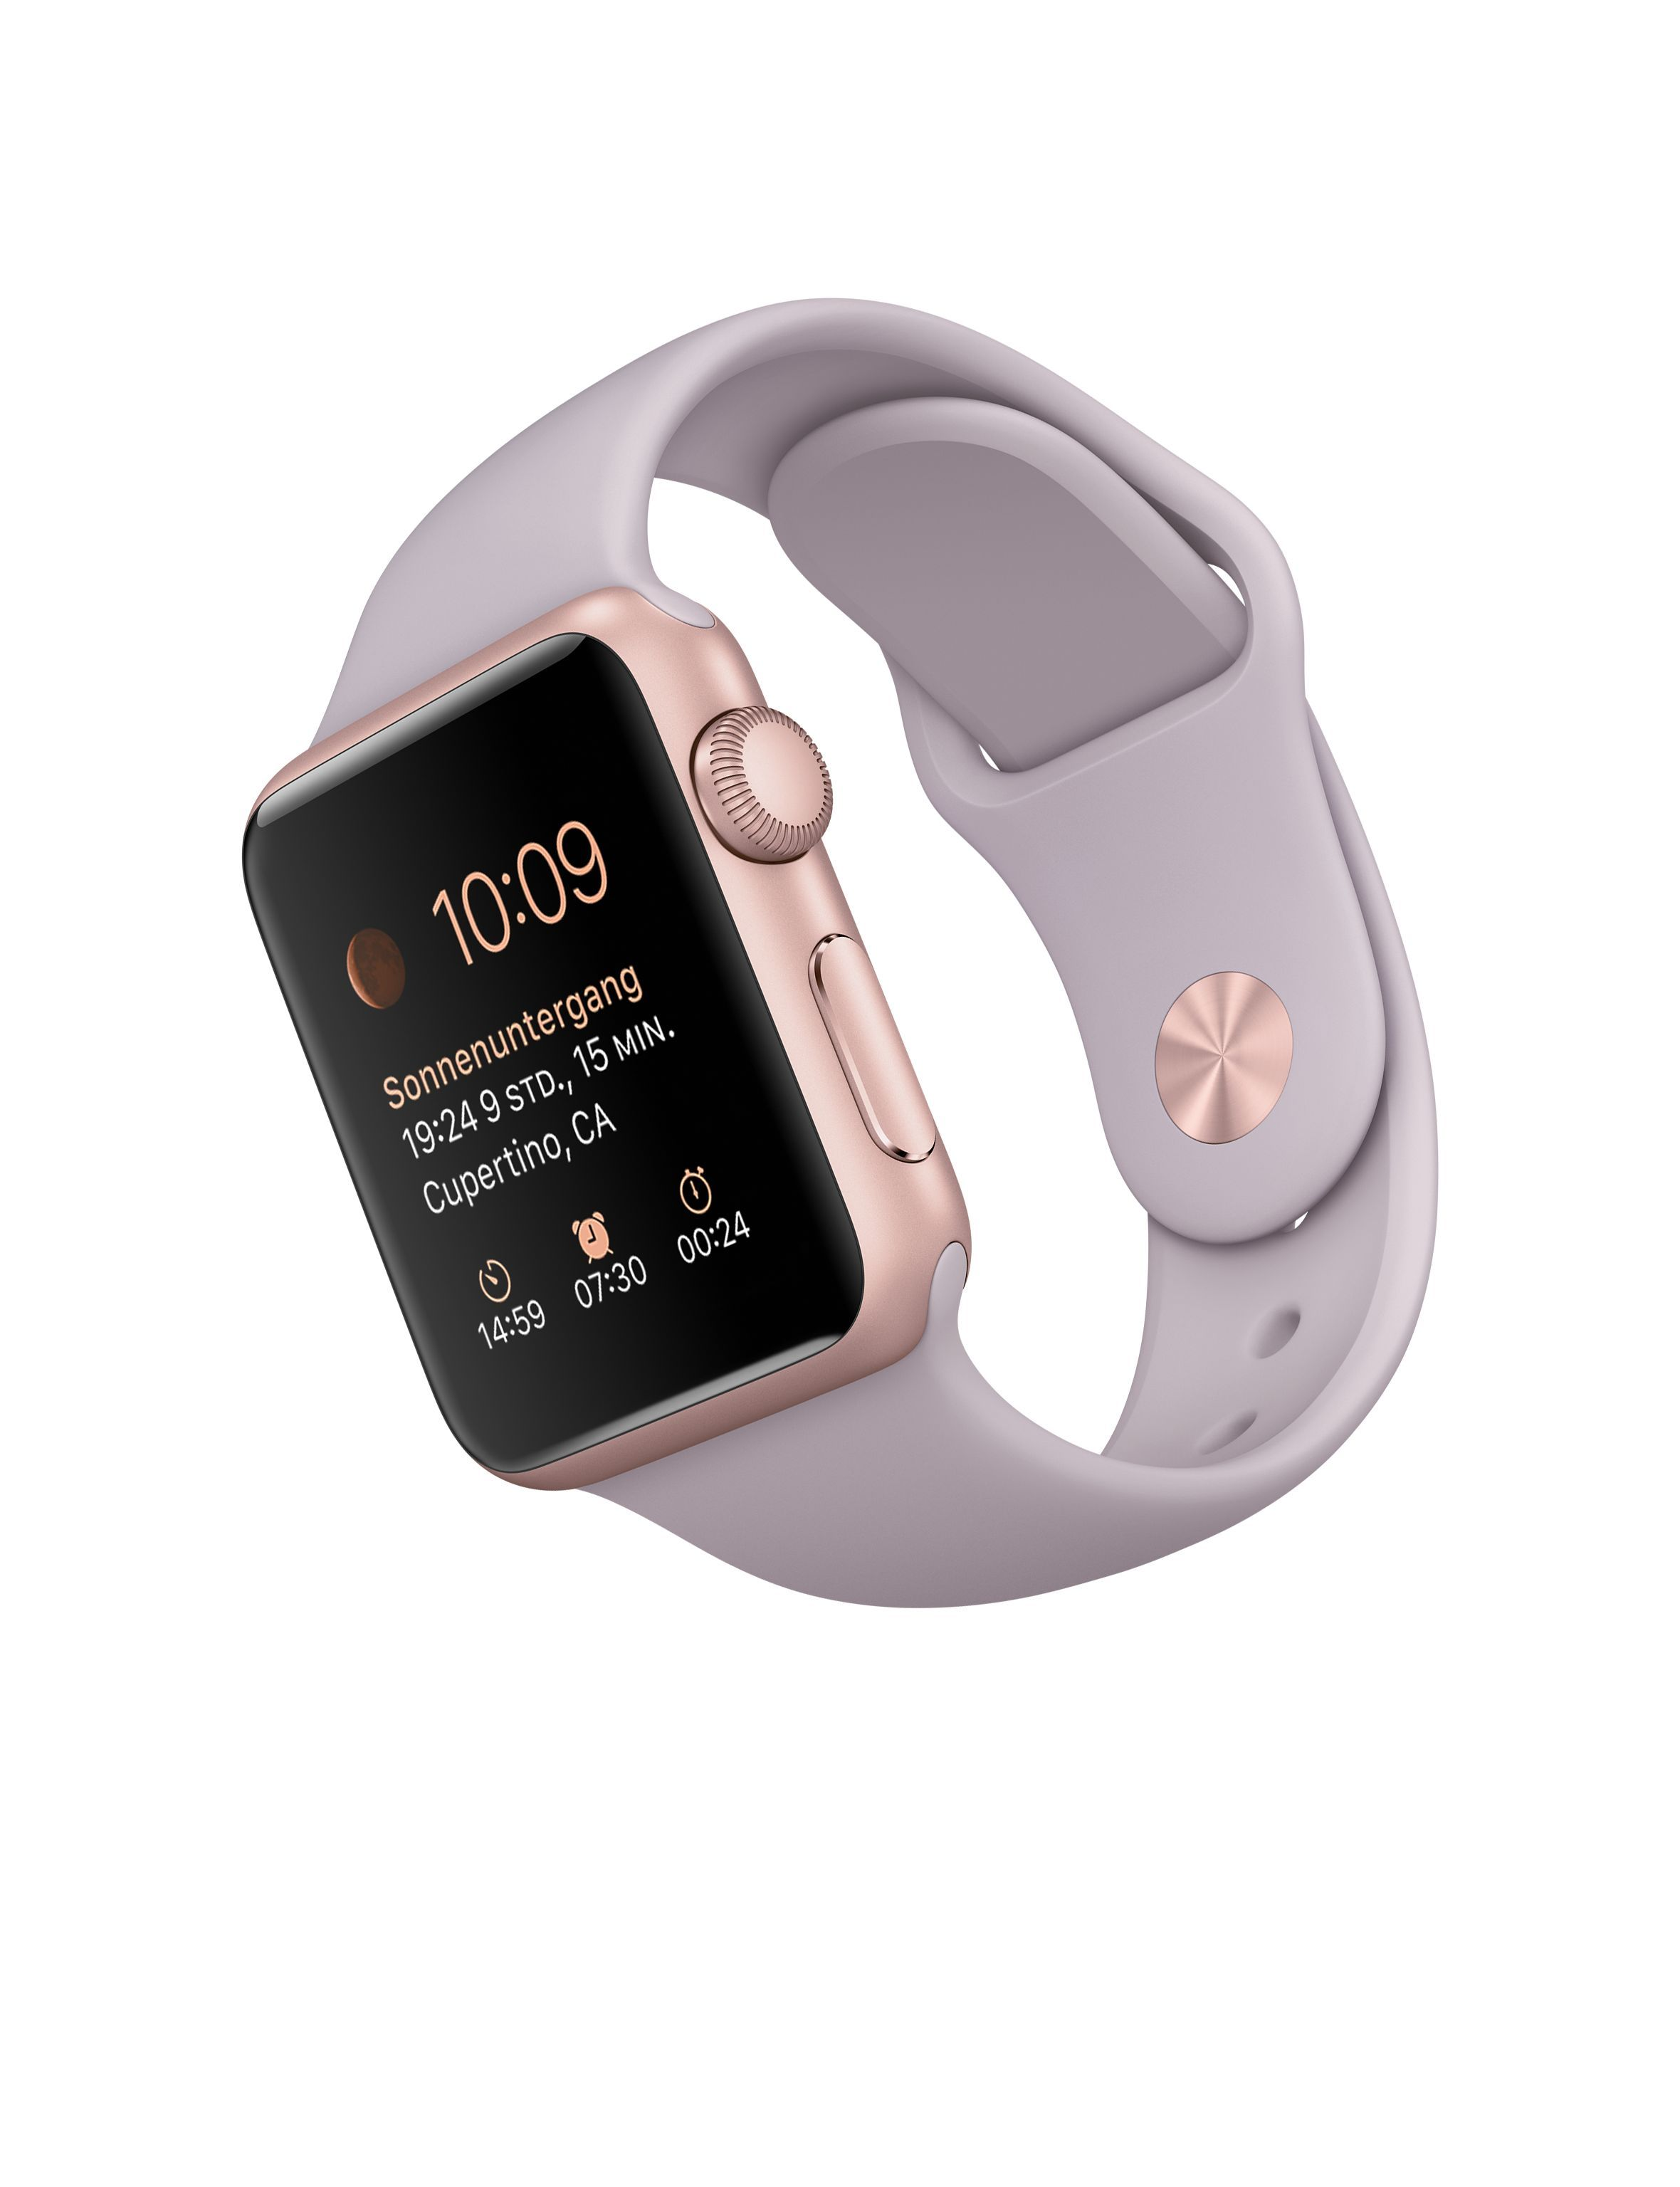 Apple Watch Sport 38 mm Aluminiumgehäuse, Roségold, mit